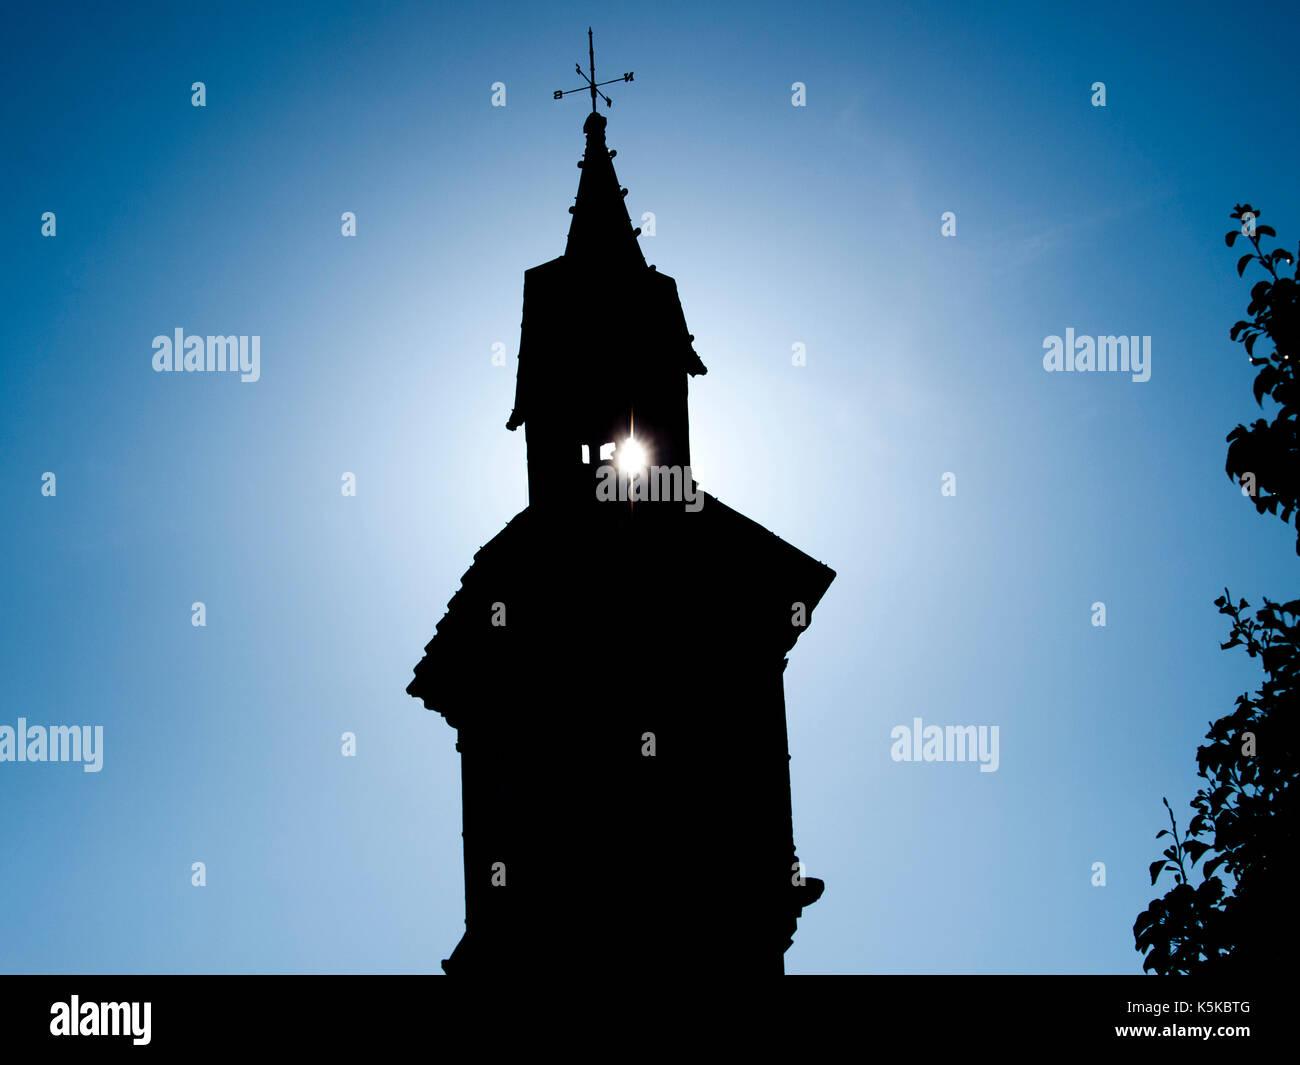 Silhouette of Prince Albert memorial clock on The Square, Barnstaple, Devon, UK - Stock Image